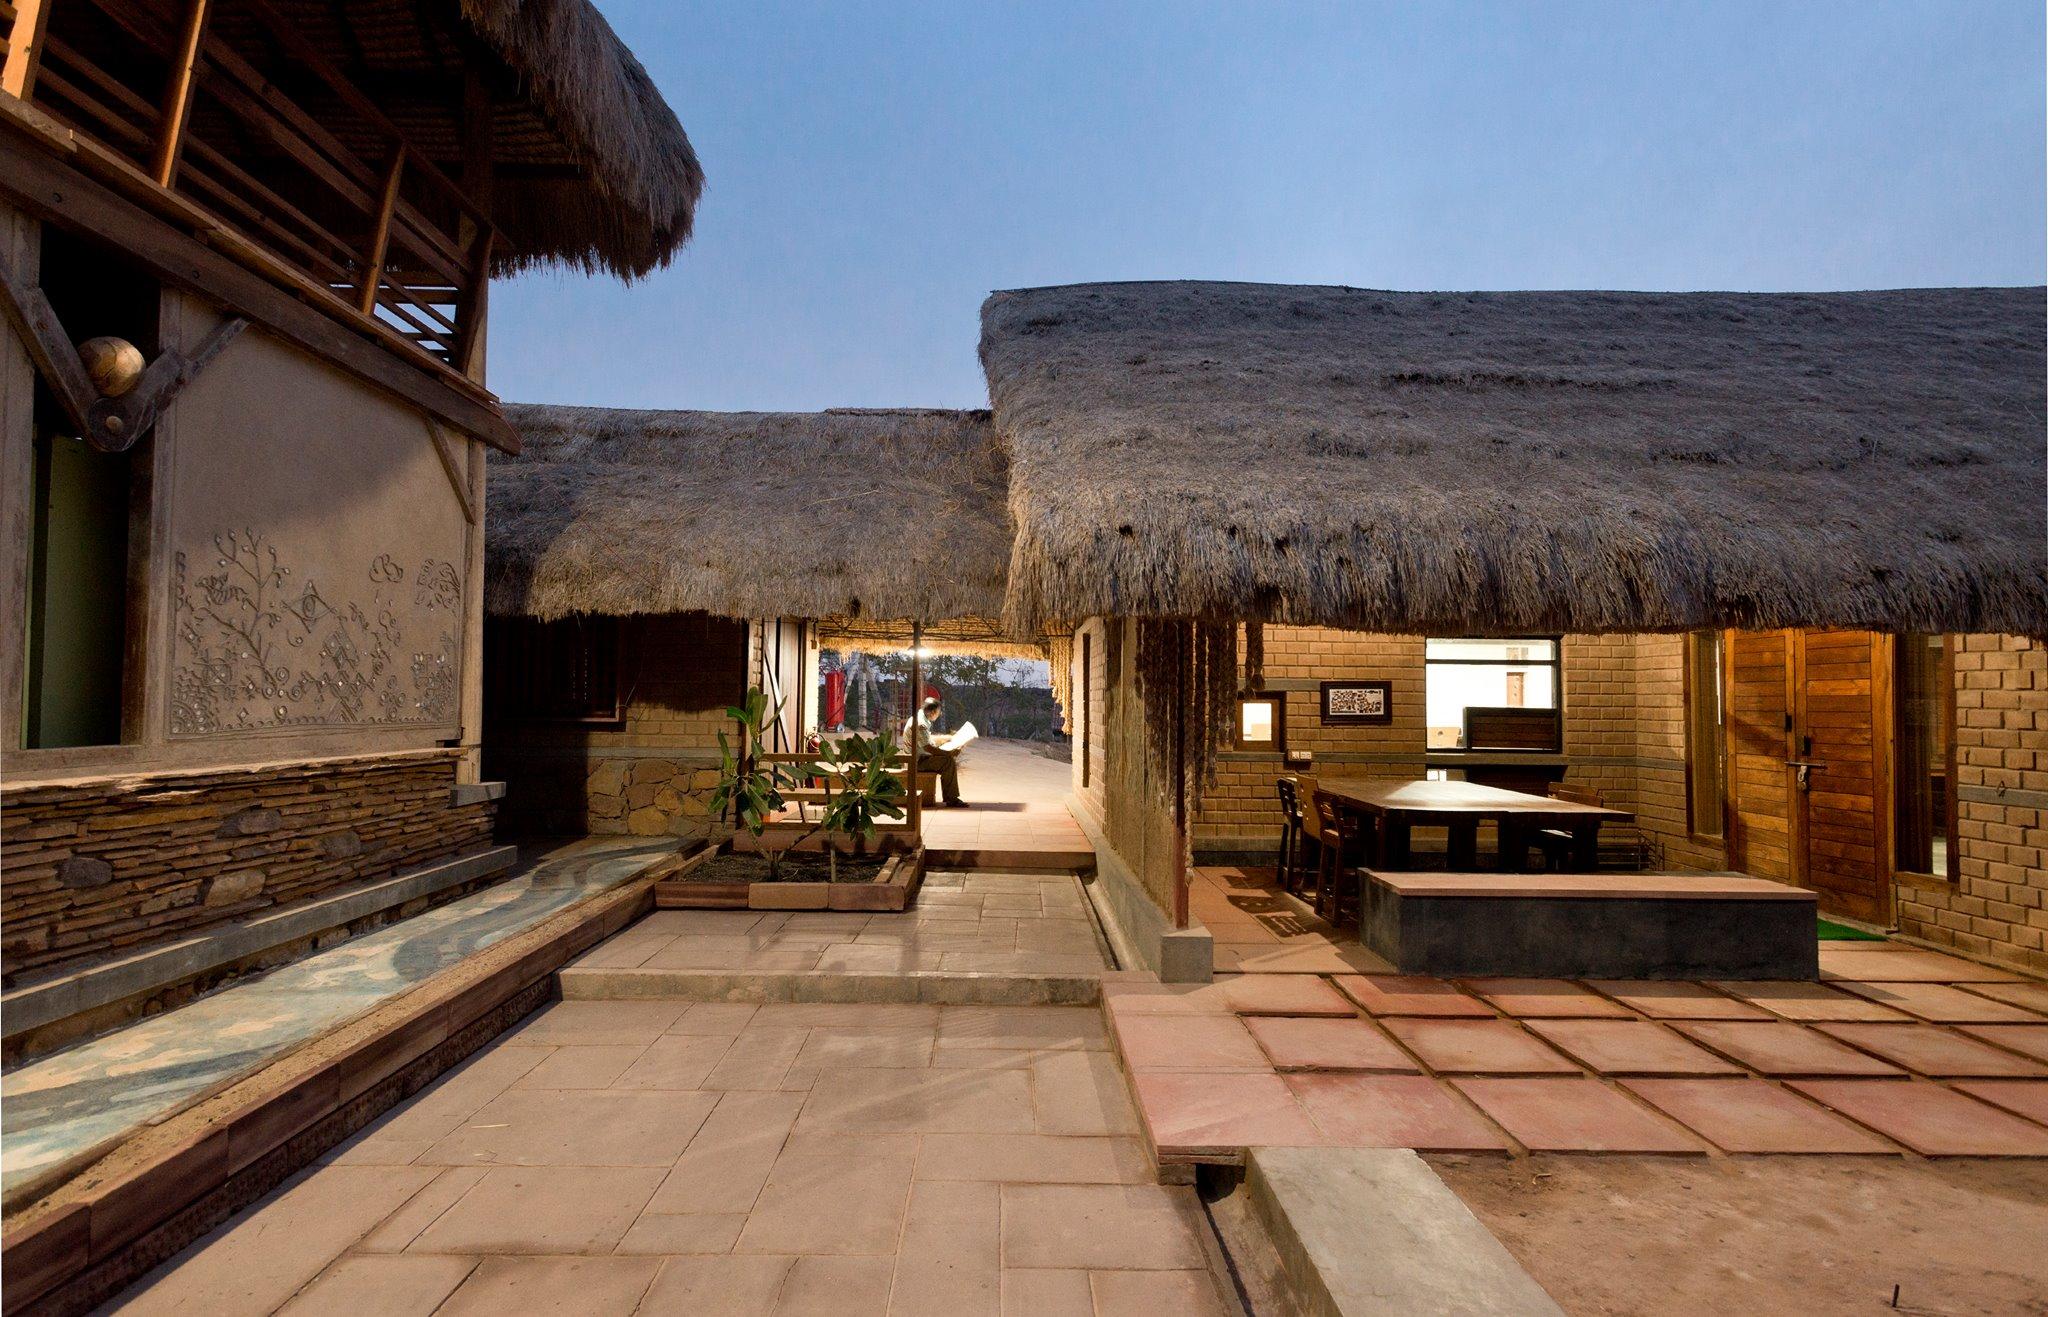 Sustainable homes. (Source: Hunnarshala Foundation)